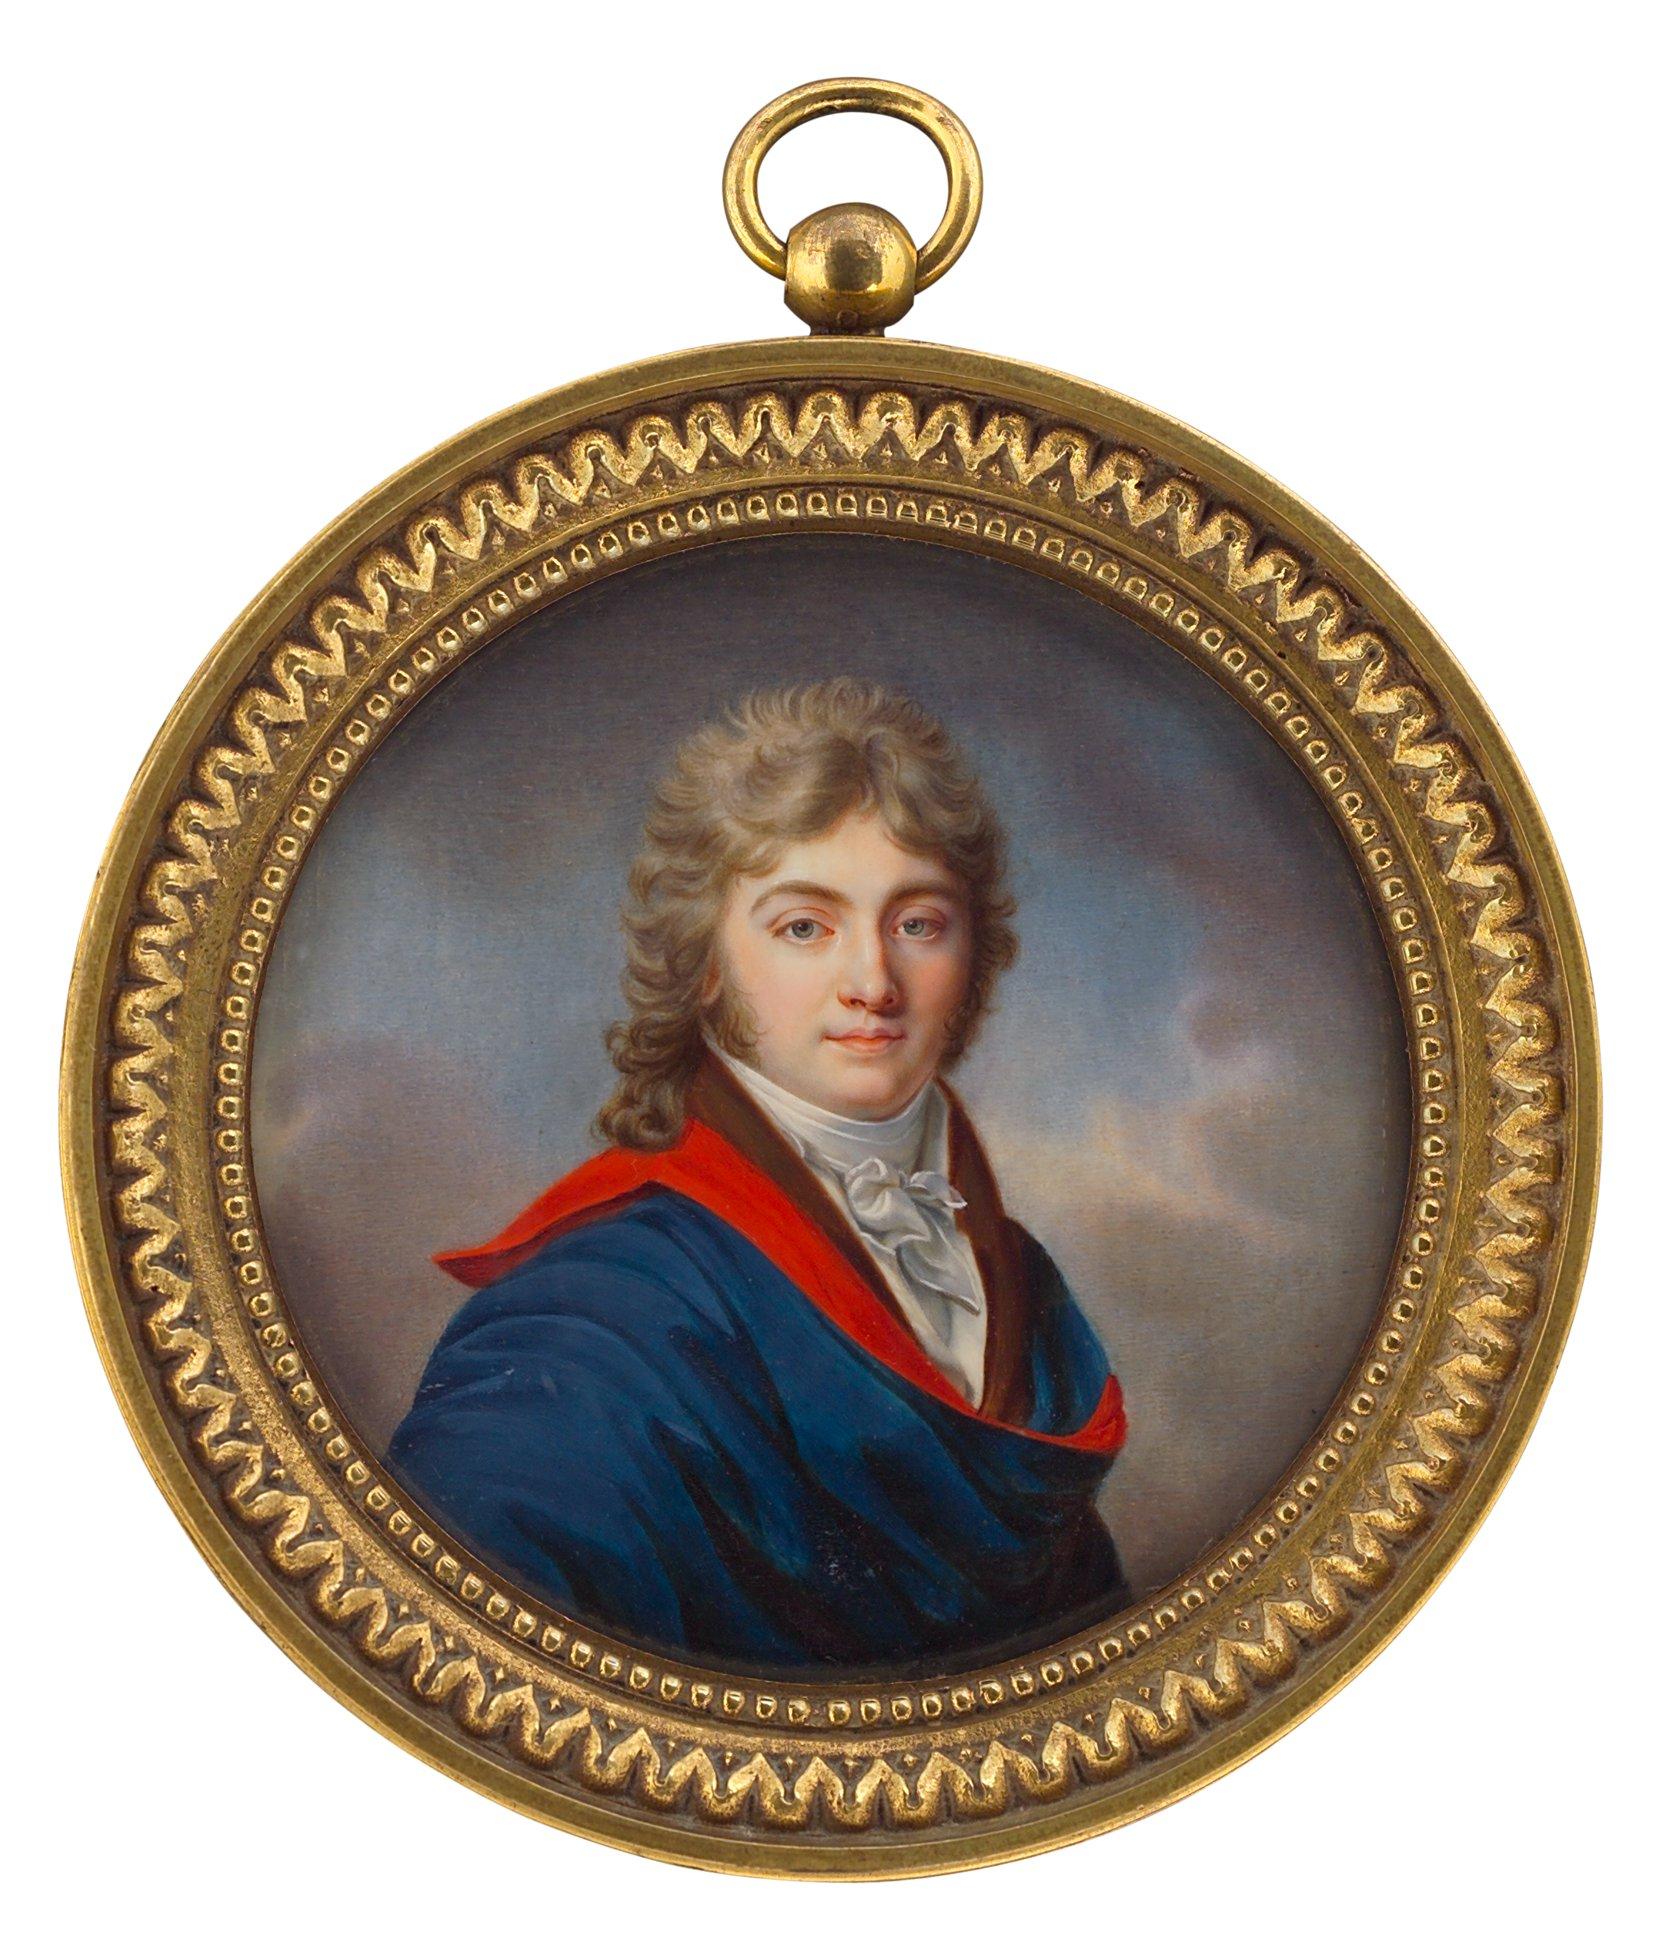 herr mit rot-blauem umhang -- jean-baptiste jacques augustin (schule) art painting